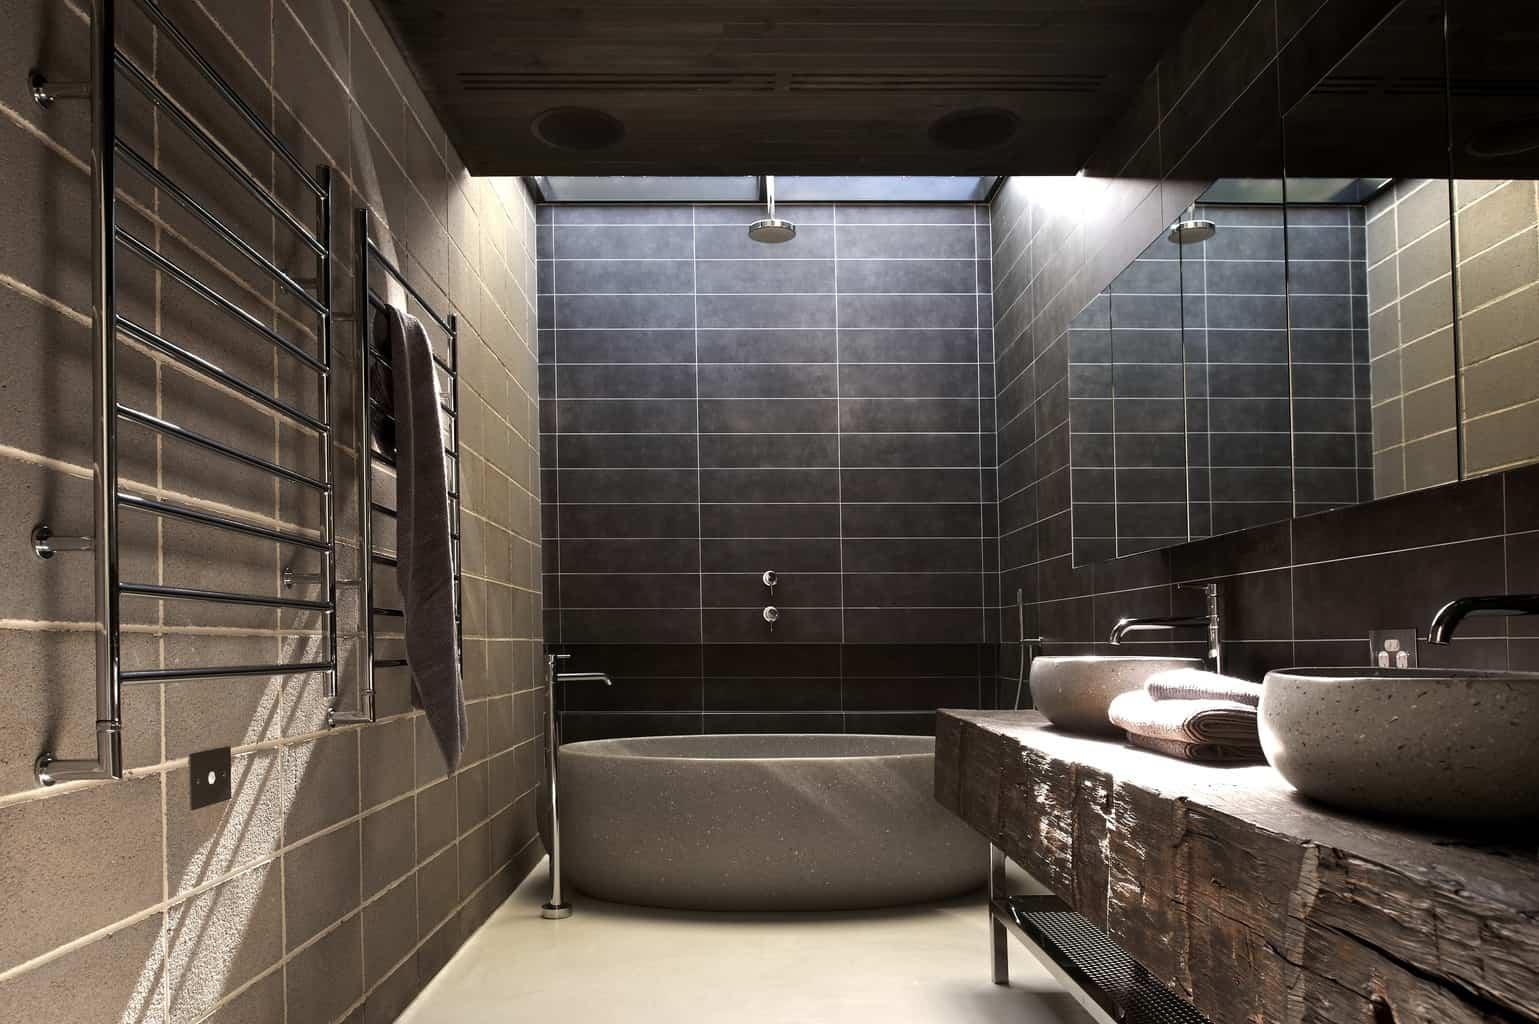 Design your ultimate bathroom sanctuary